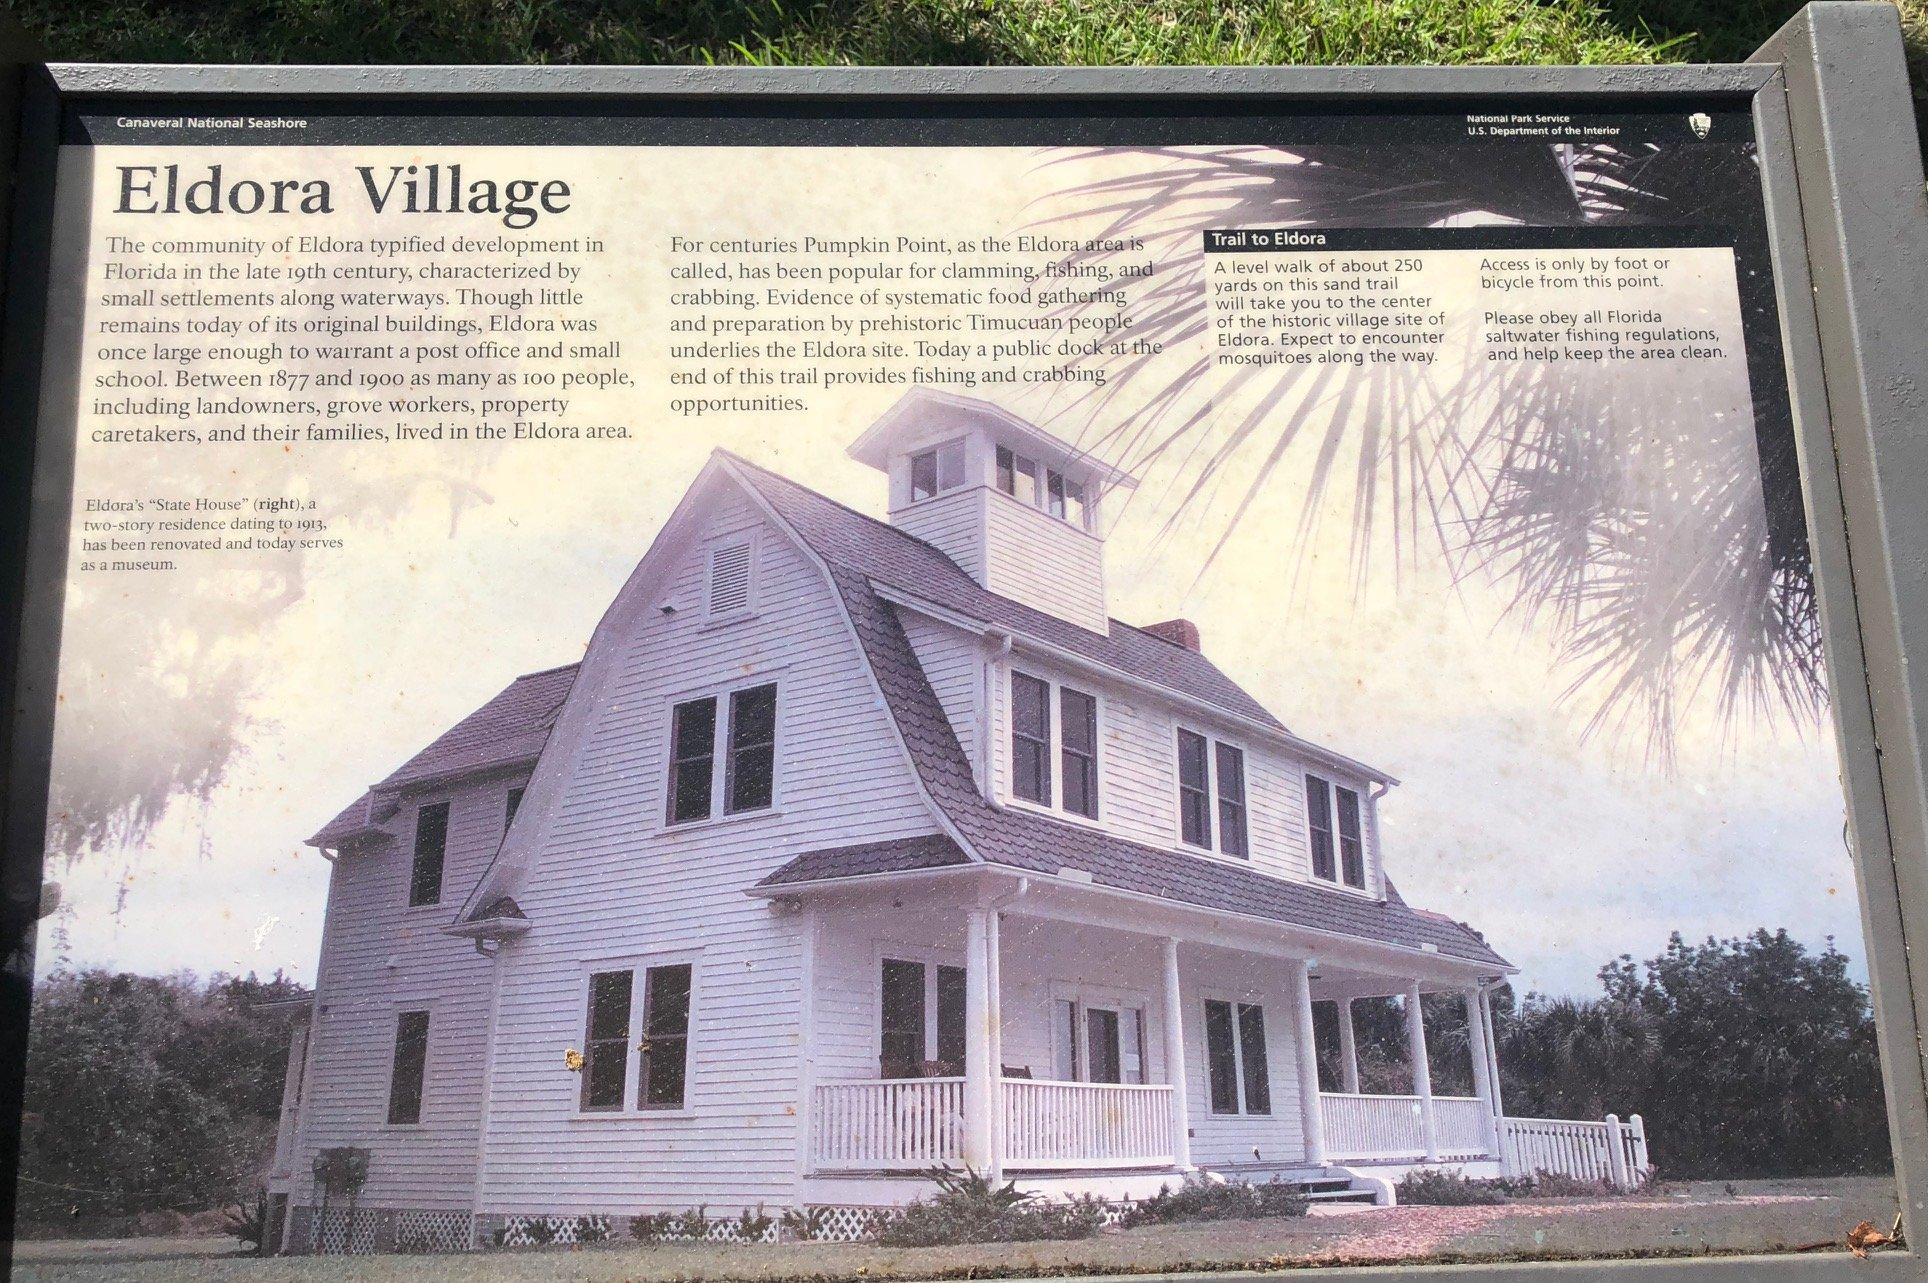 Plaque of information on the Eldora Village.